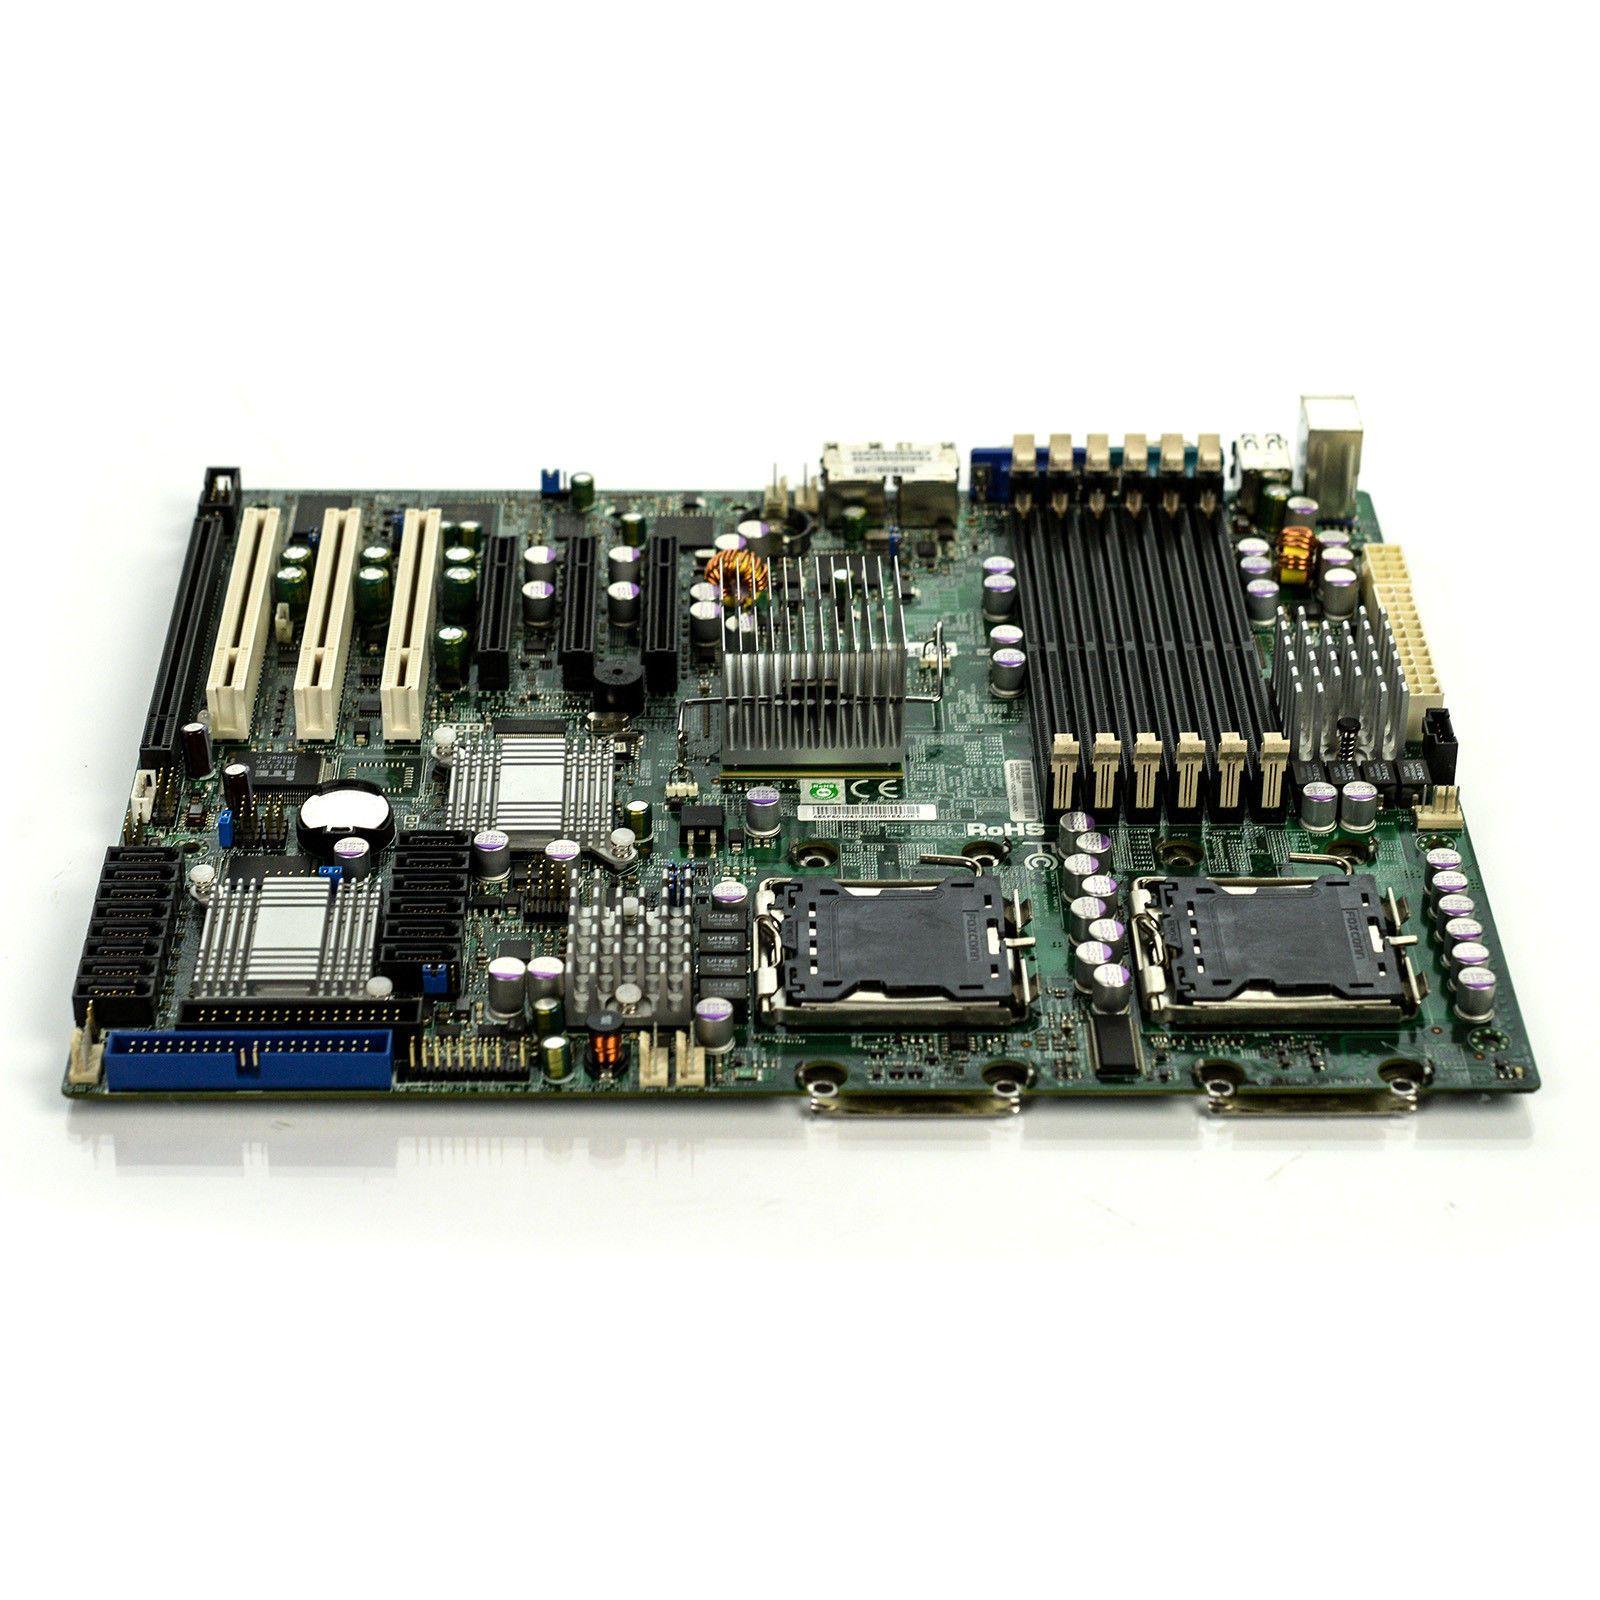 X7DCL-3 5100 yonga iş istasyonu anakart Xeon 54-pin serisi 771 destekler 100% testi iyi kalite